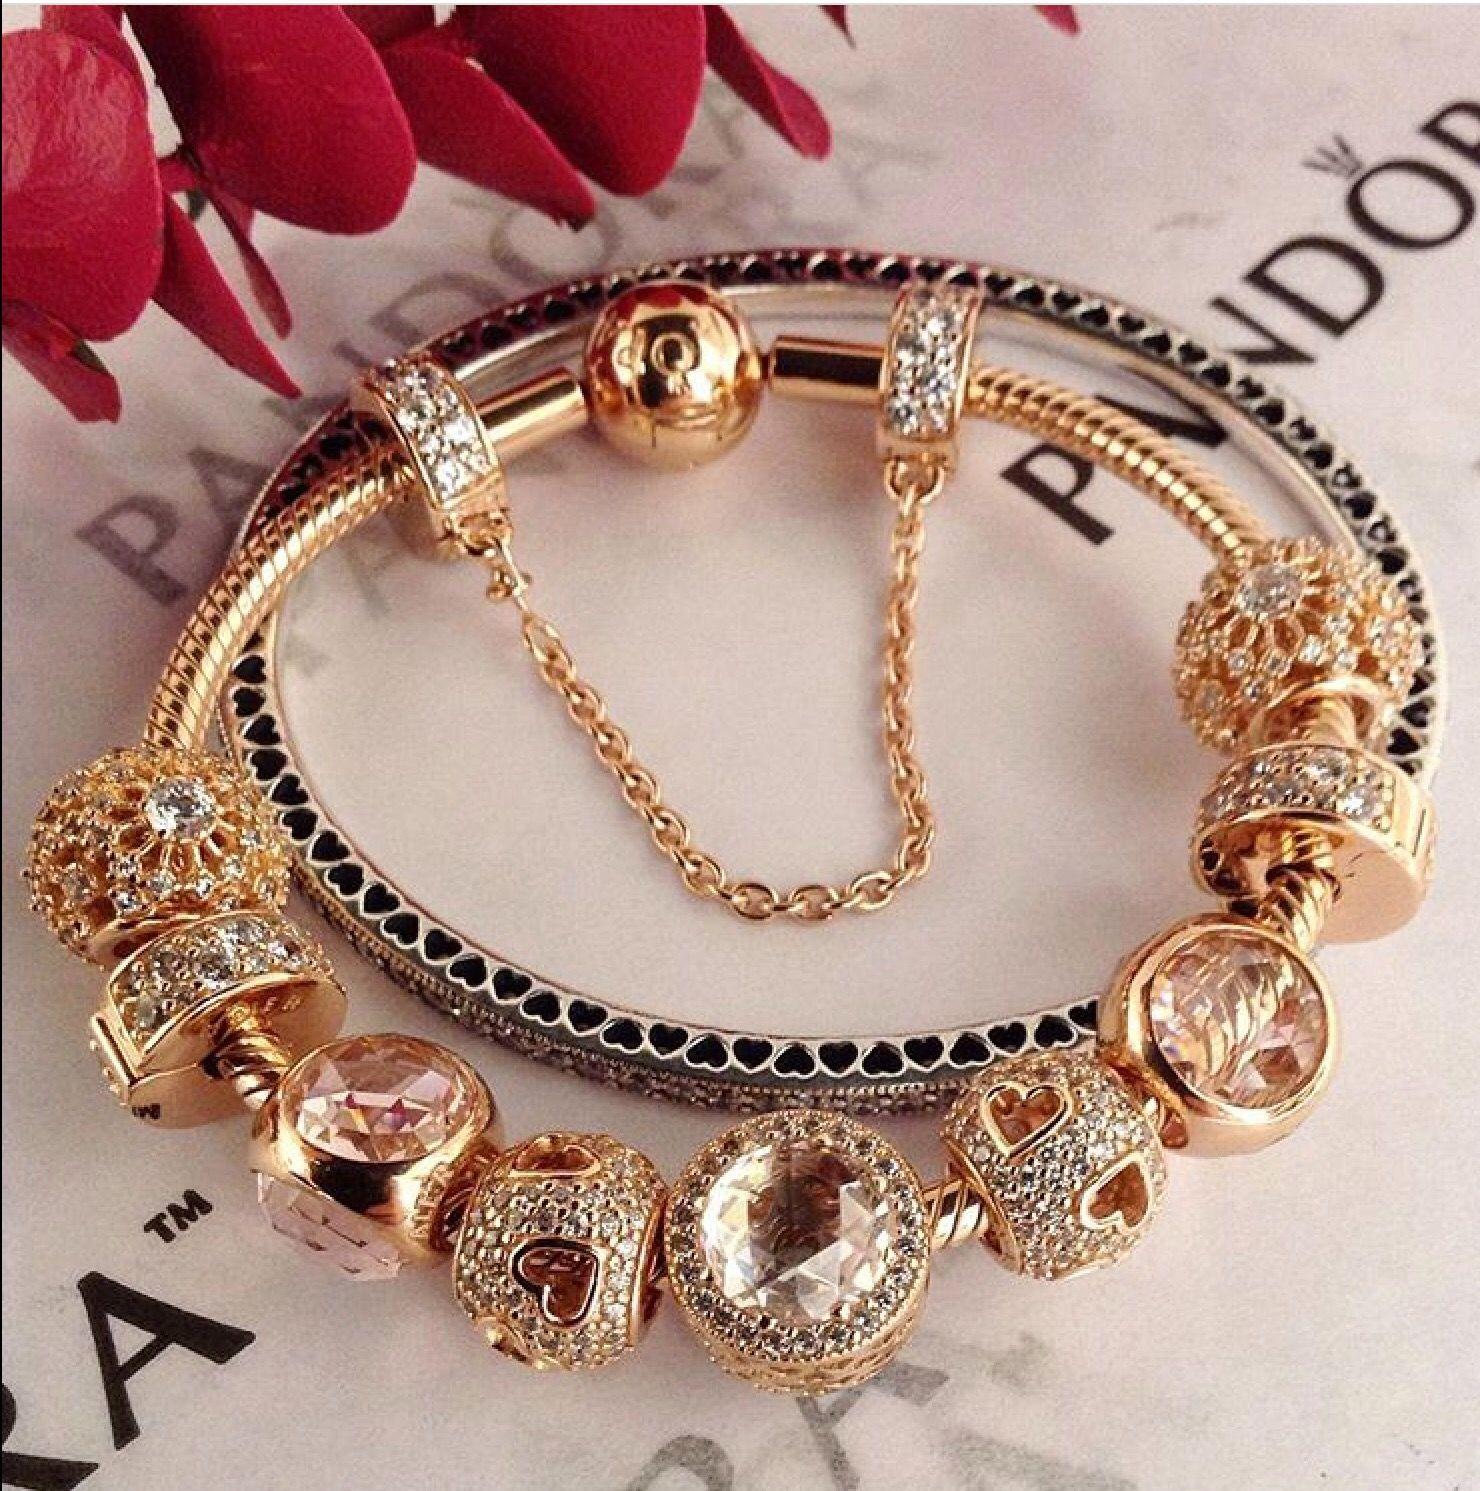 Pin by jeannie padilla on jewels pinterest jewel bracelets and